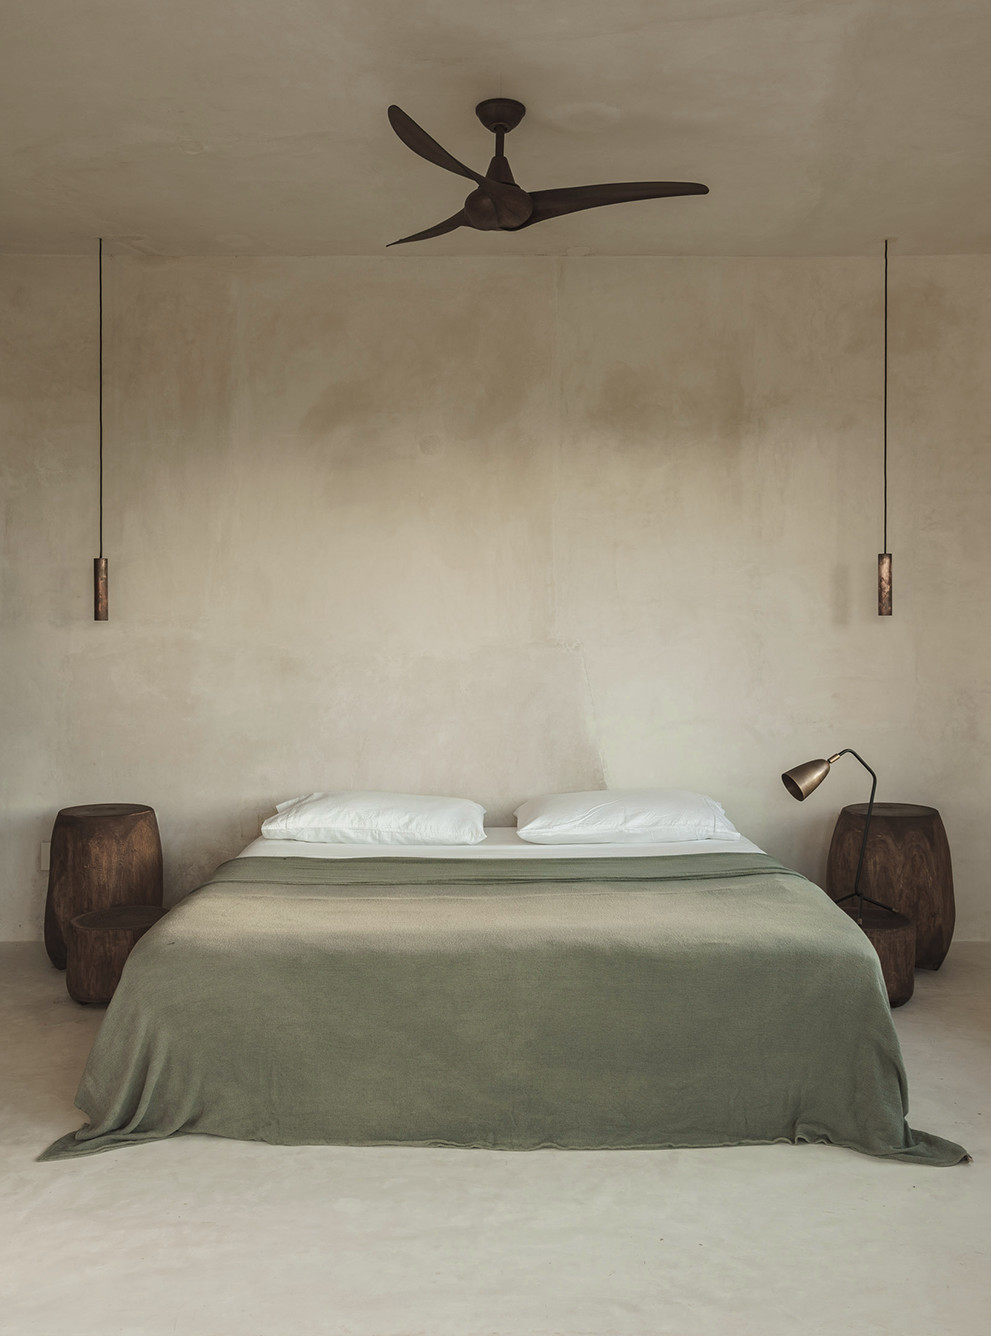 tulum-treehouse-house-010-01.jpg